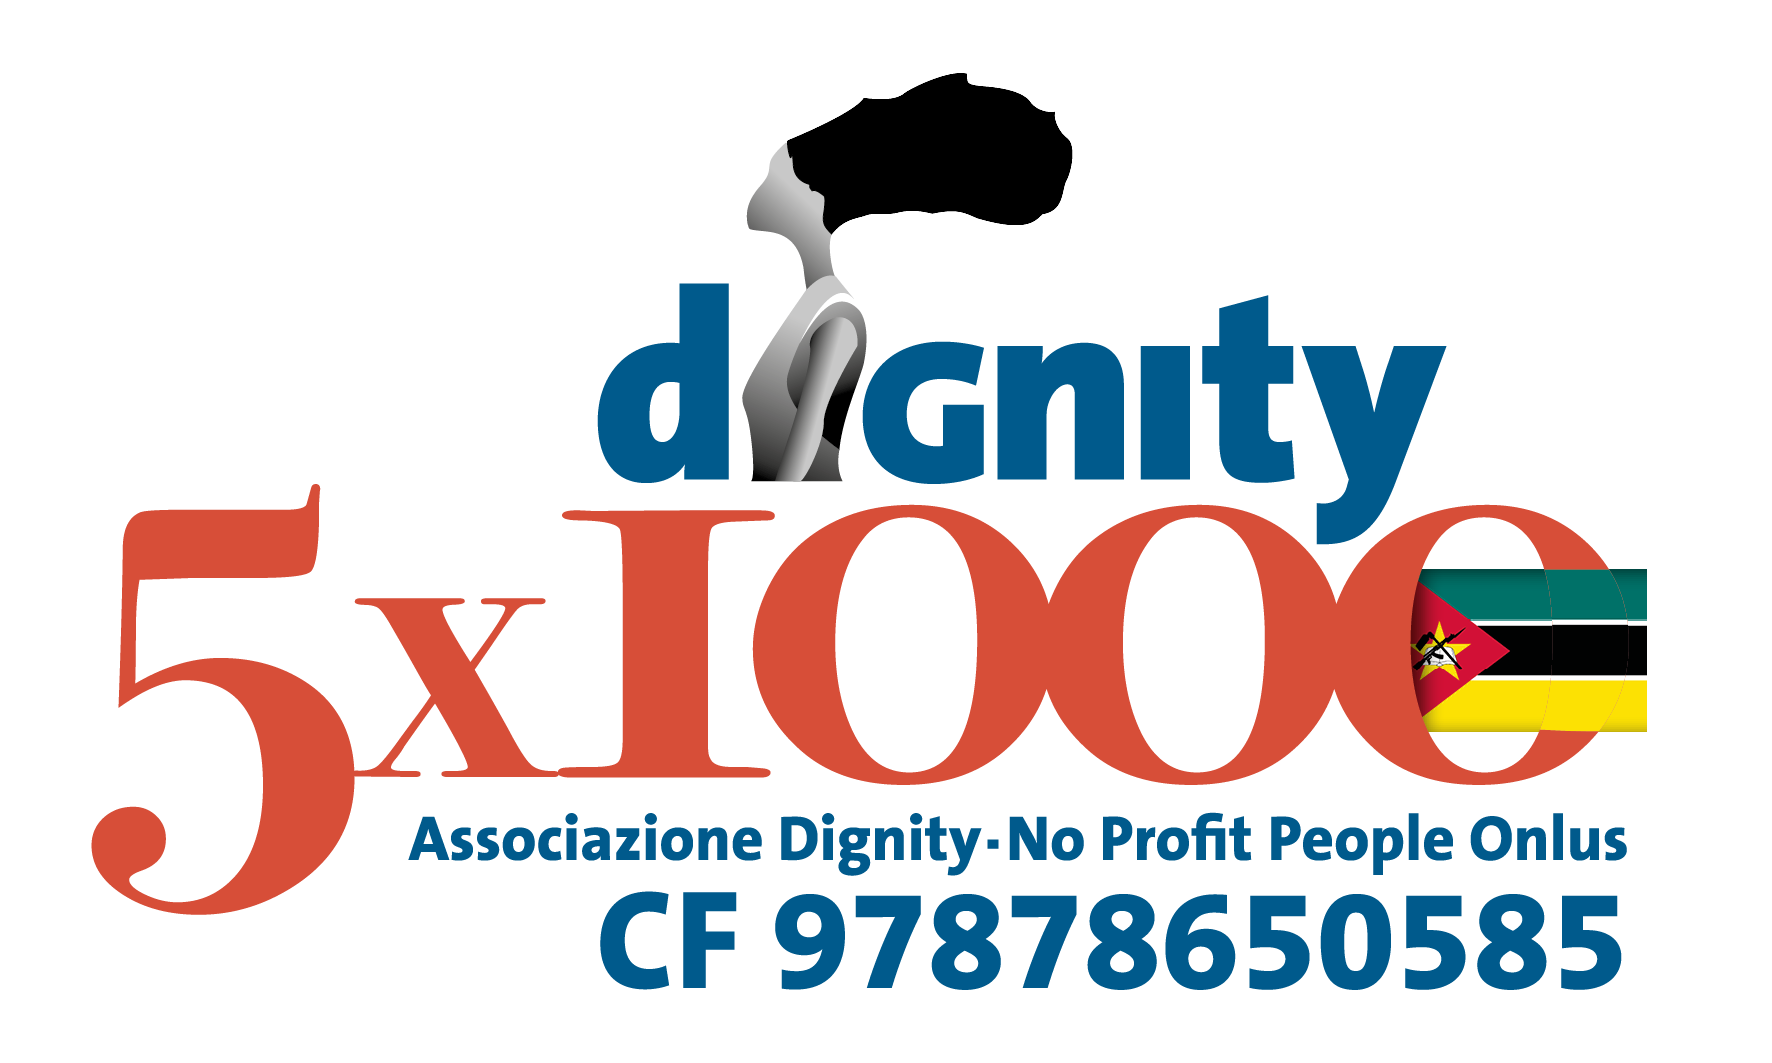 logo dignity - 5 x 1000